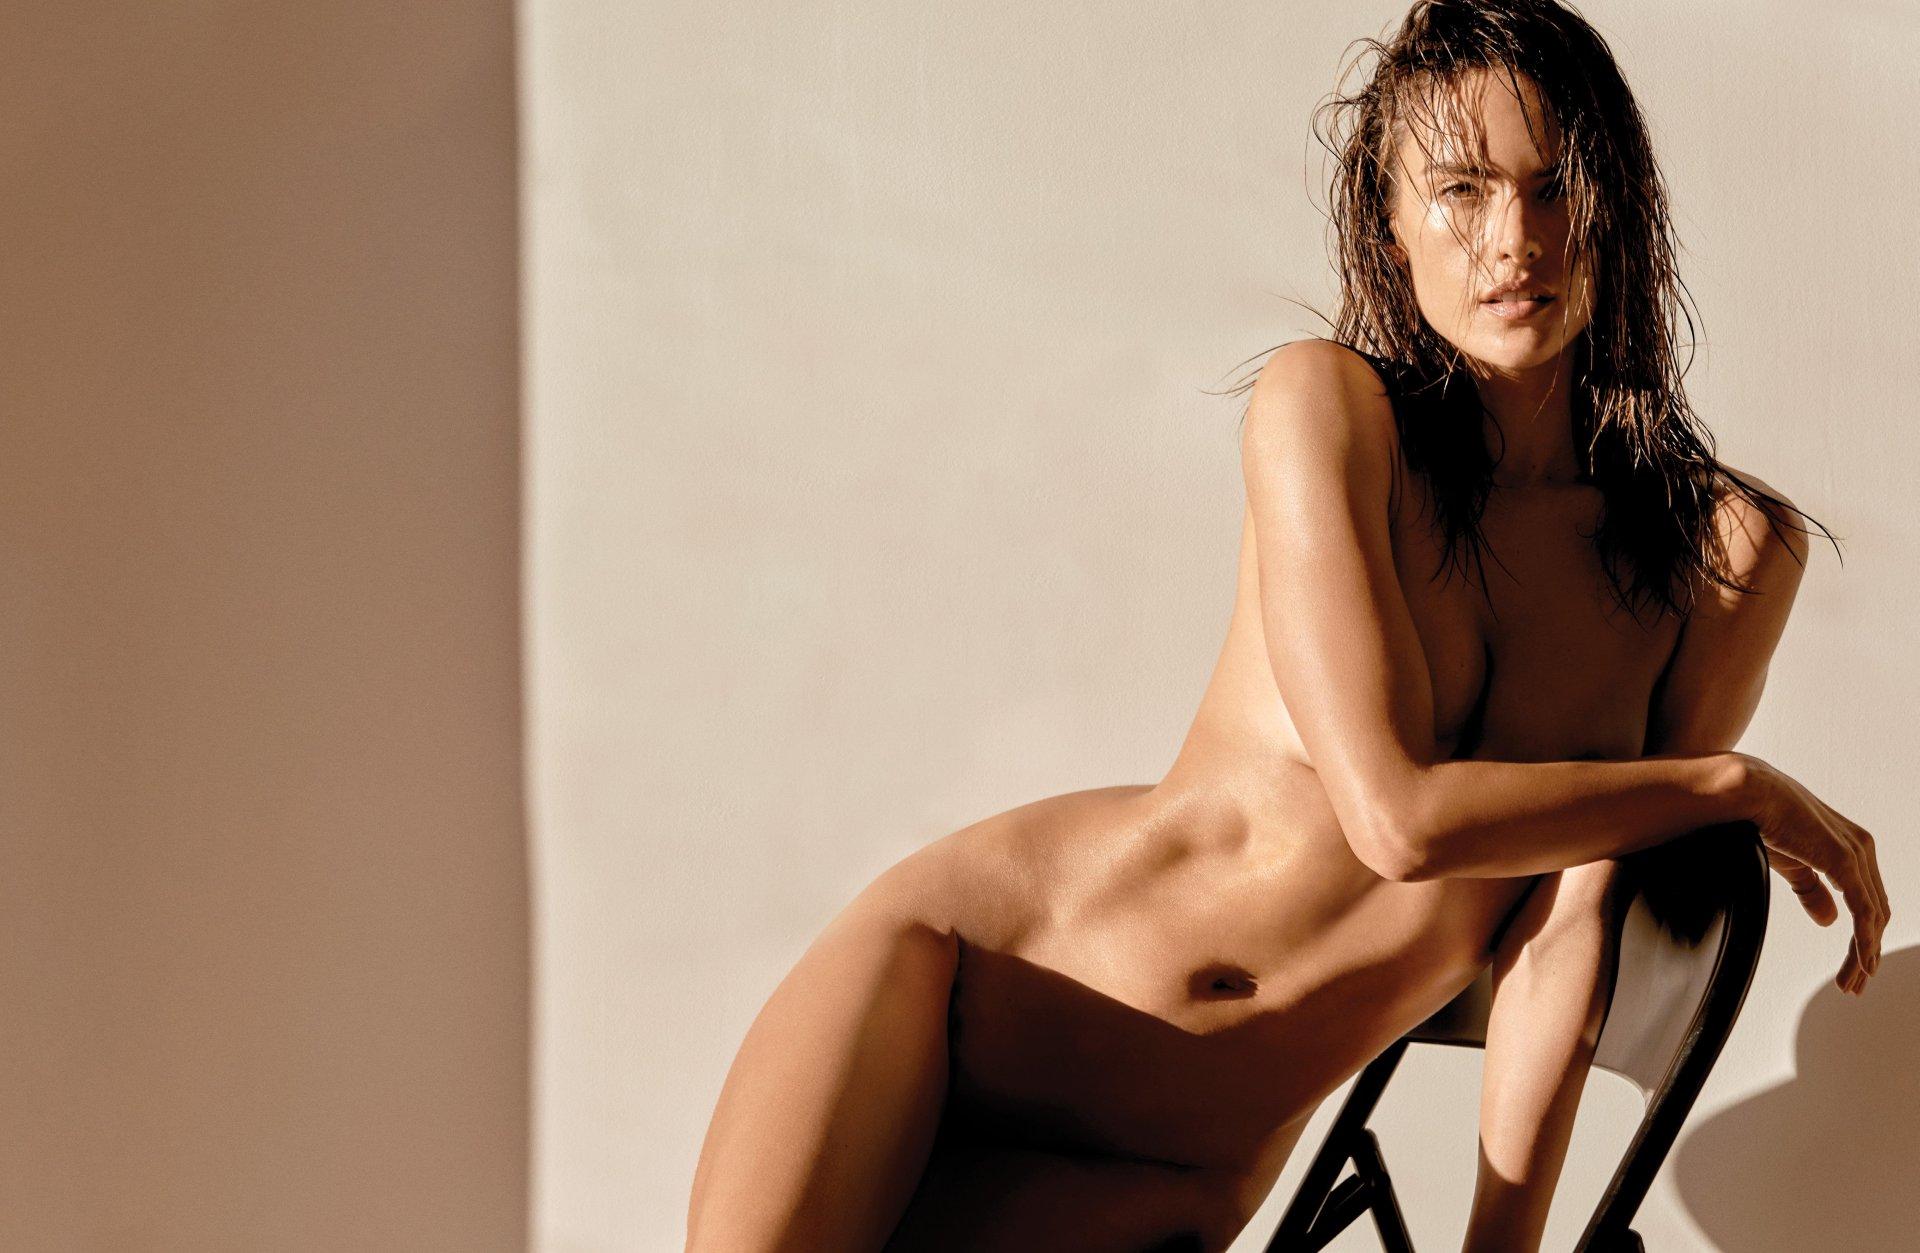 Hot skinny asian girls